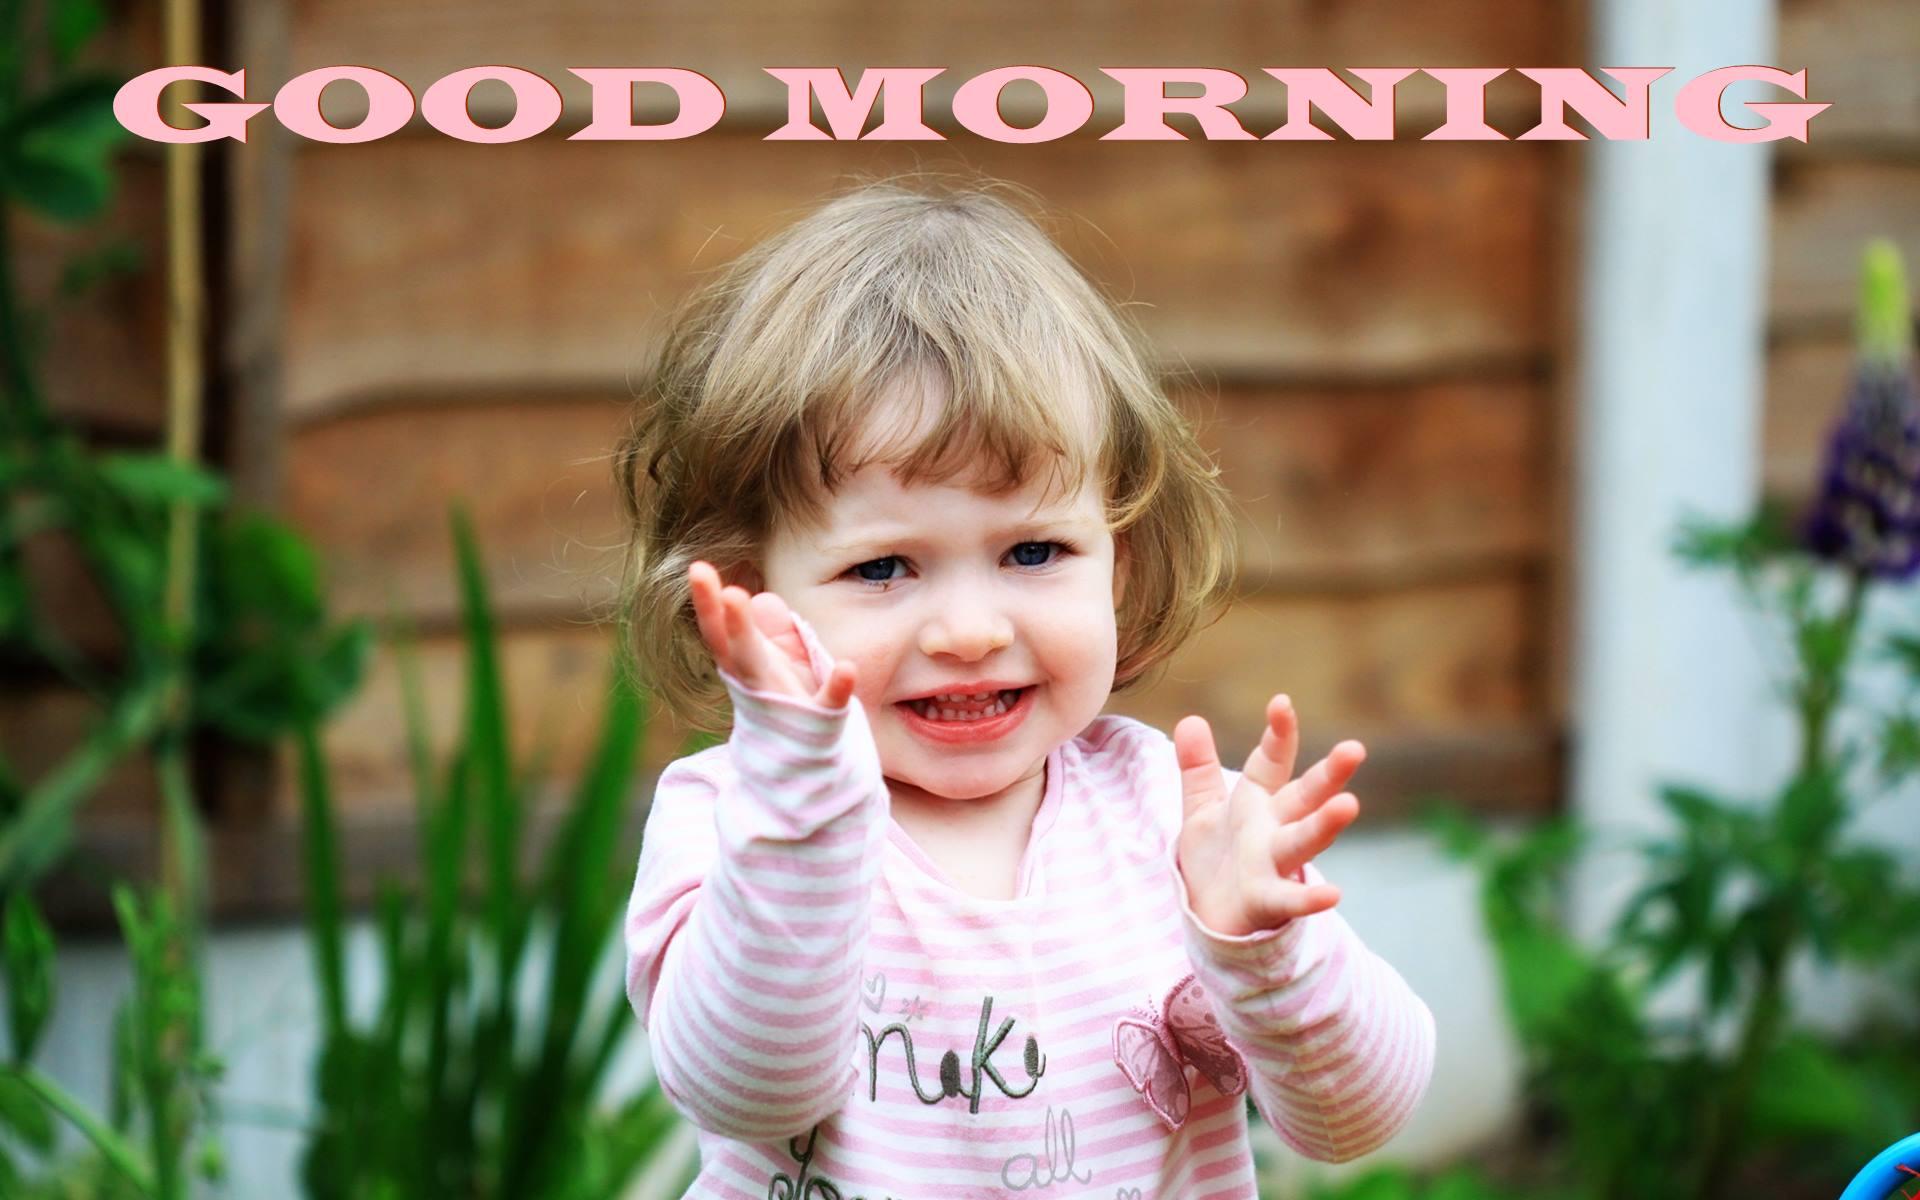 Little Baby Wishing Good Morning